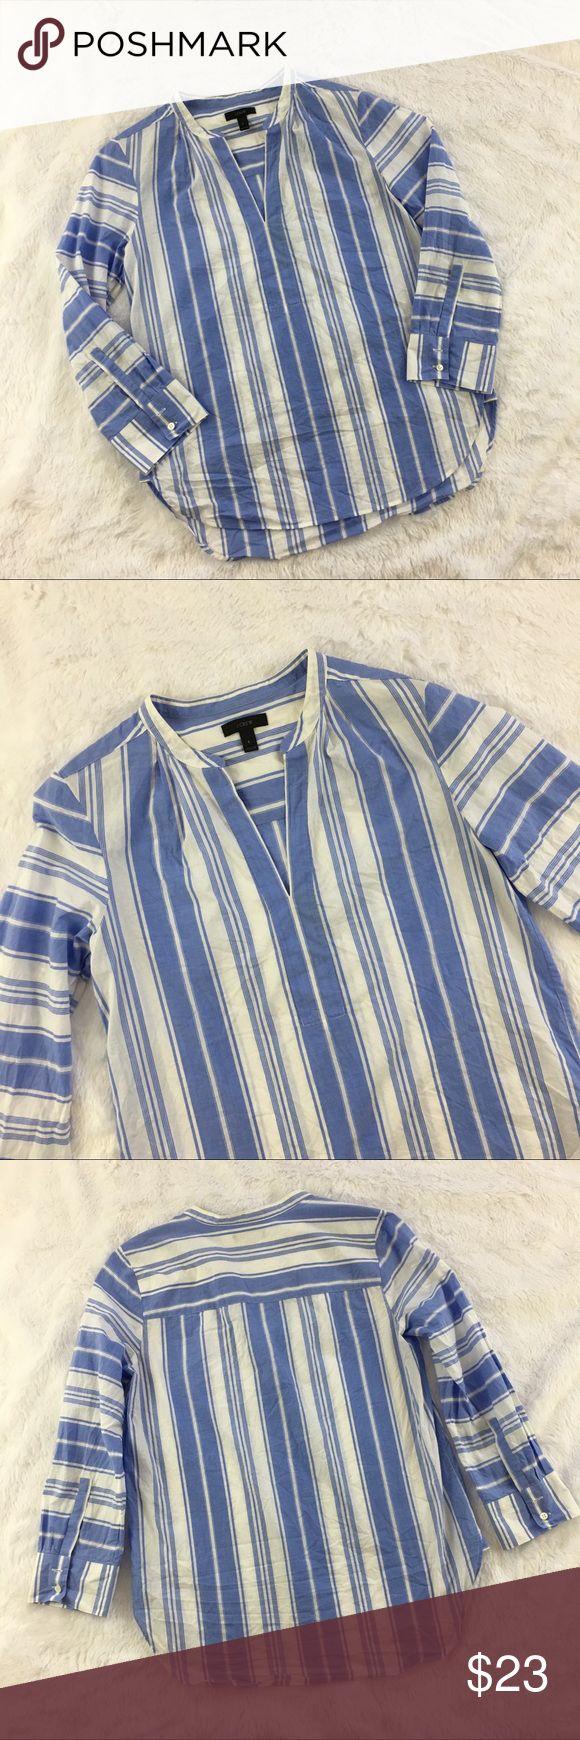 J Crew Striped 3/4 Sleeve V-Neck Shirt J Crew striped v-neck striped shirt. Size small. Gently used, without flaws. J Crew Tops Tunics